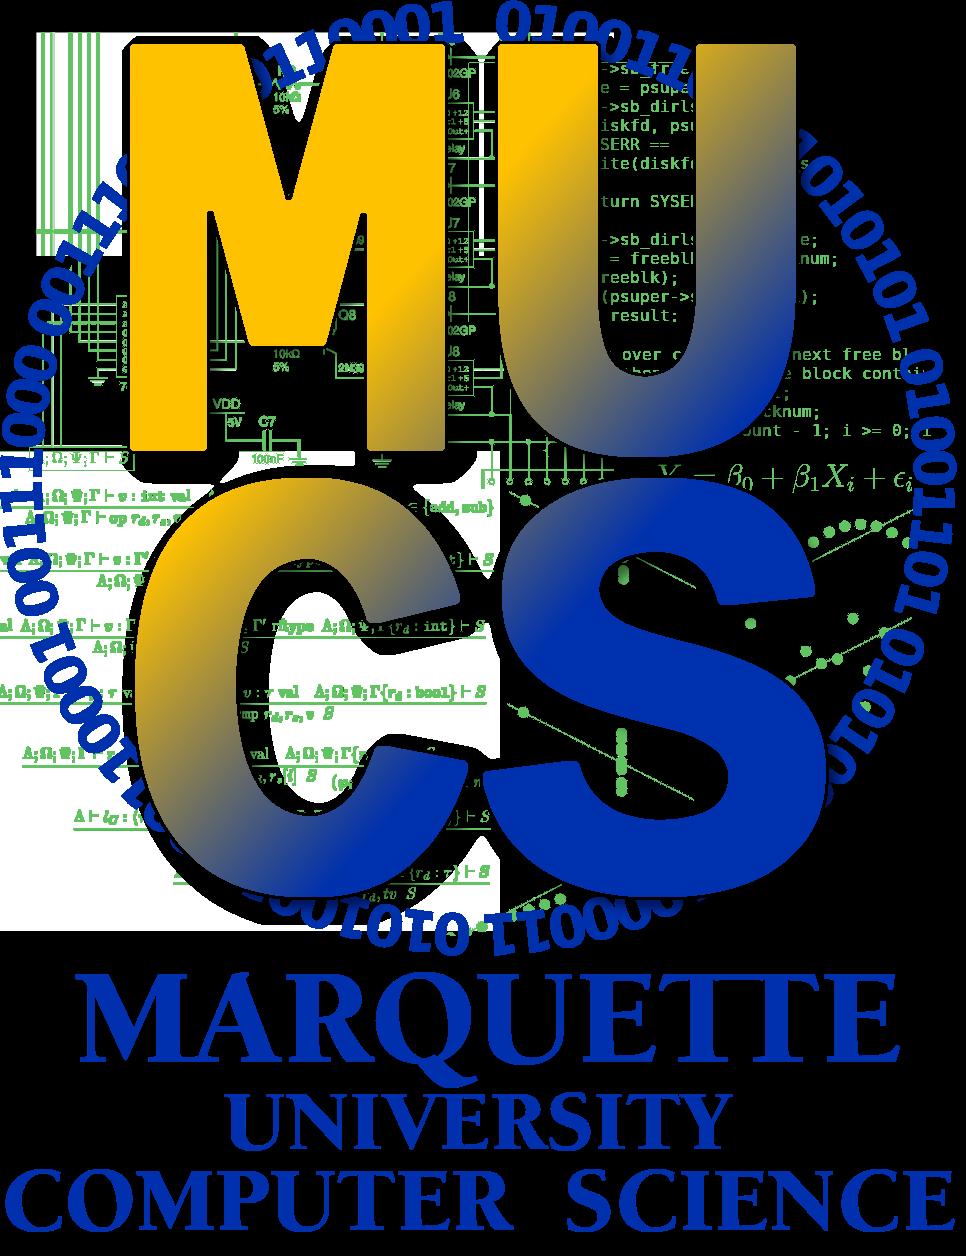 Marquette University Computer Science